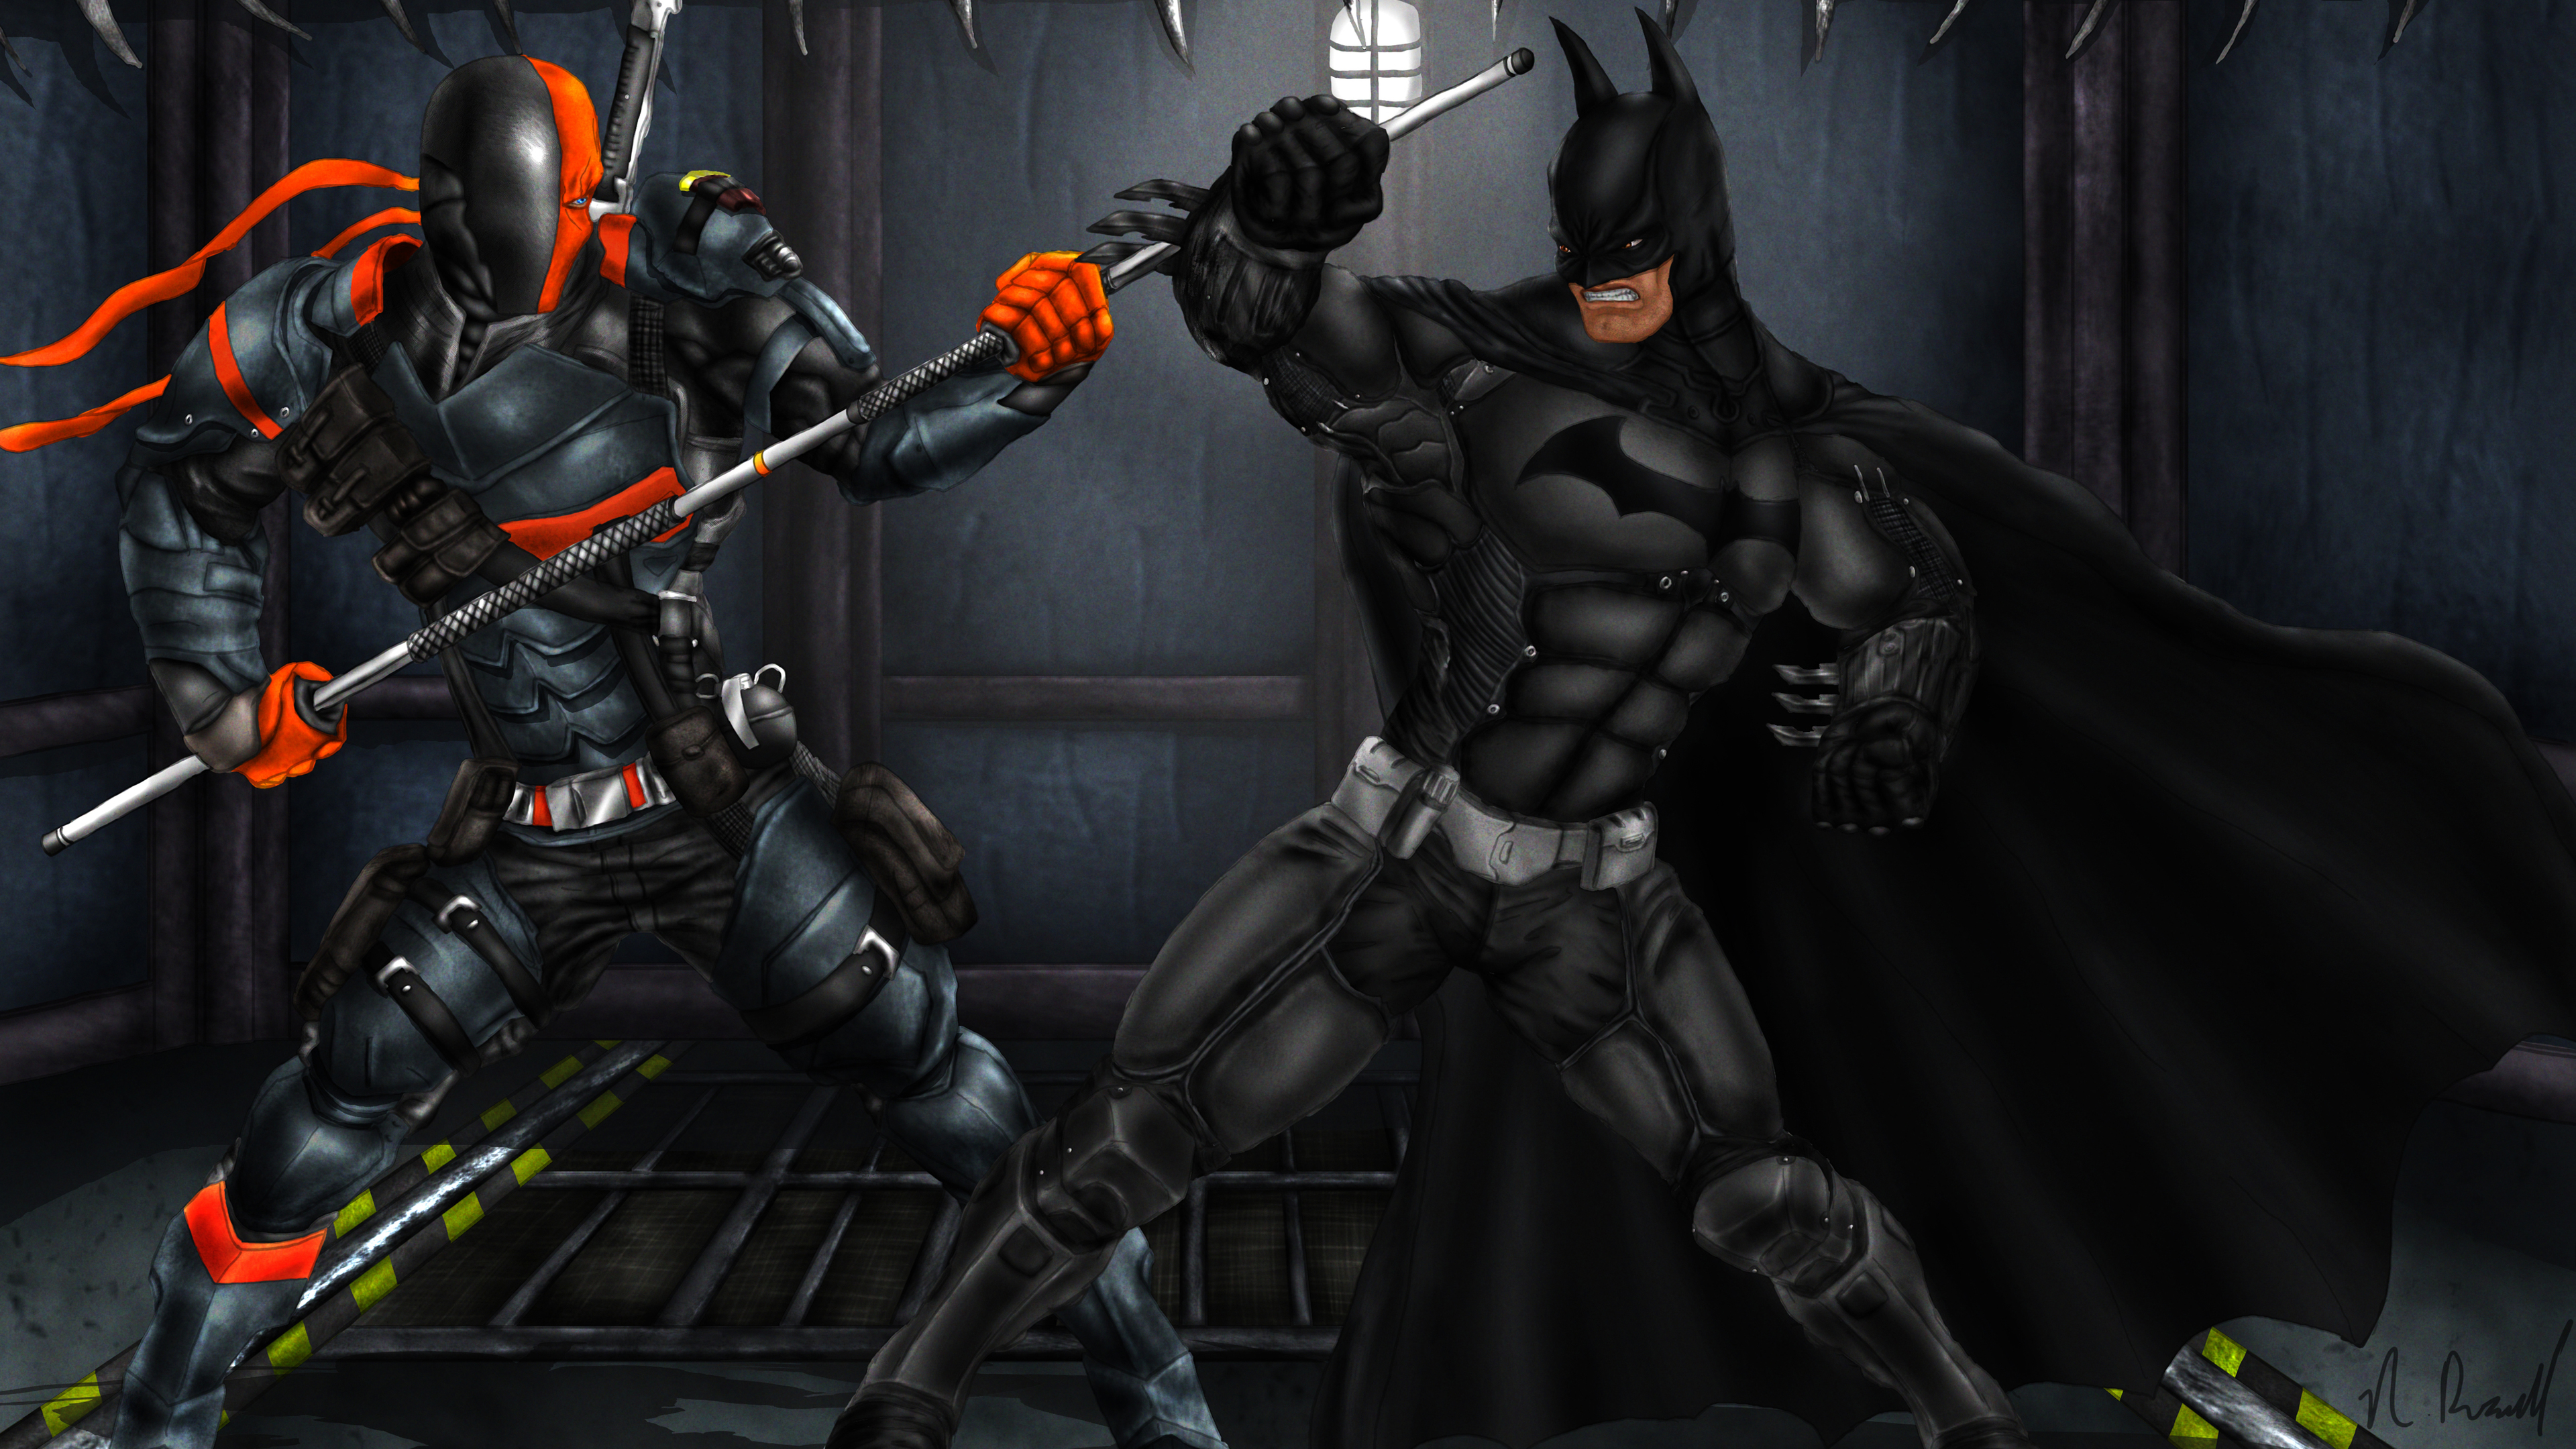 batman arkham origins deathstroke 4k art 1548526609 - Batman Arkham Origins Deathstroke 4k Art - supervillain wallpapers, superheroes wallpapers, hd-wallpapers, deviantart wallpapers, deathstroke wallpapers, batman wallpapers, artwork wallpapers, 5k wallpapers, 4k-wallpapers